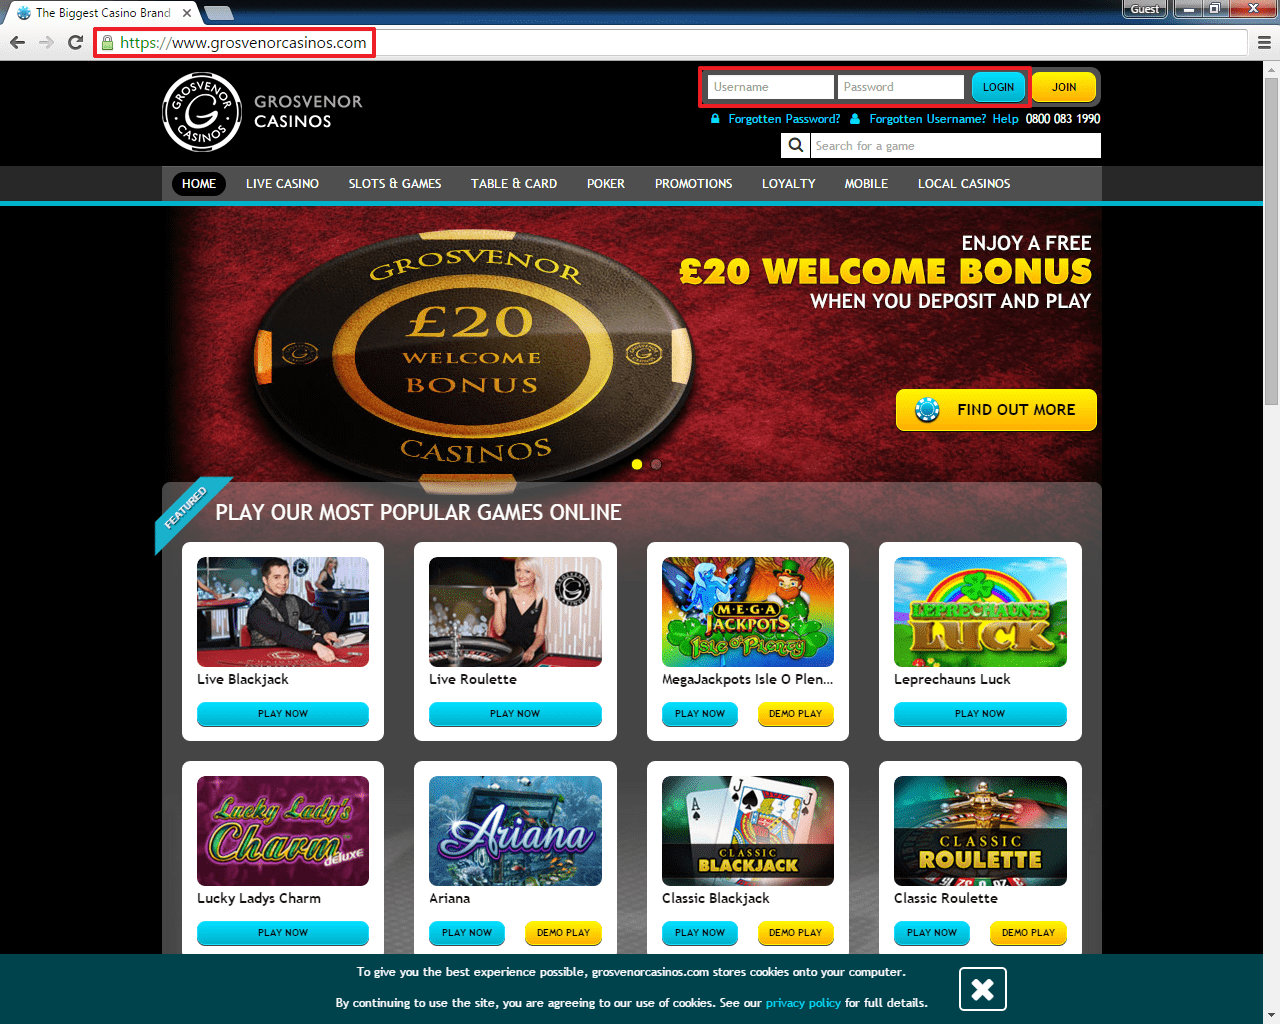 Grosvenor casino login